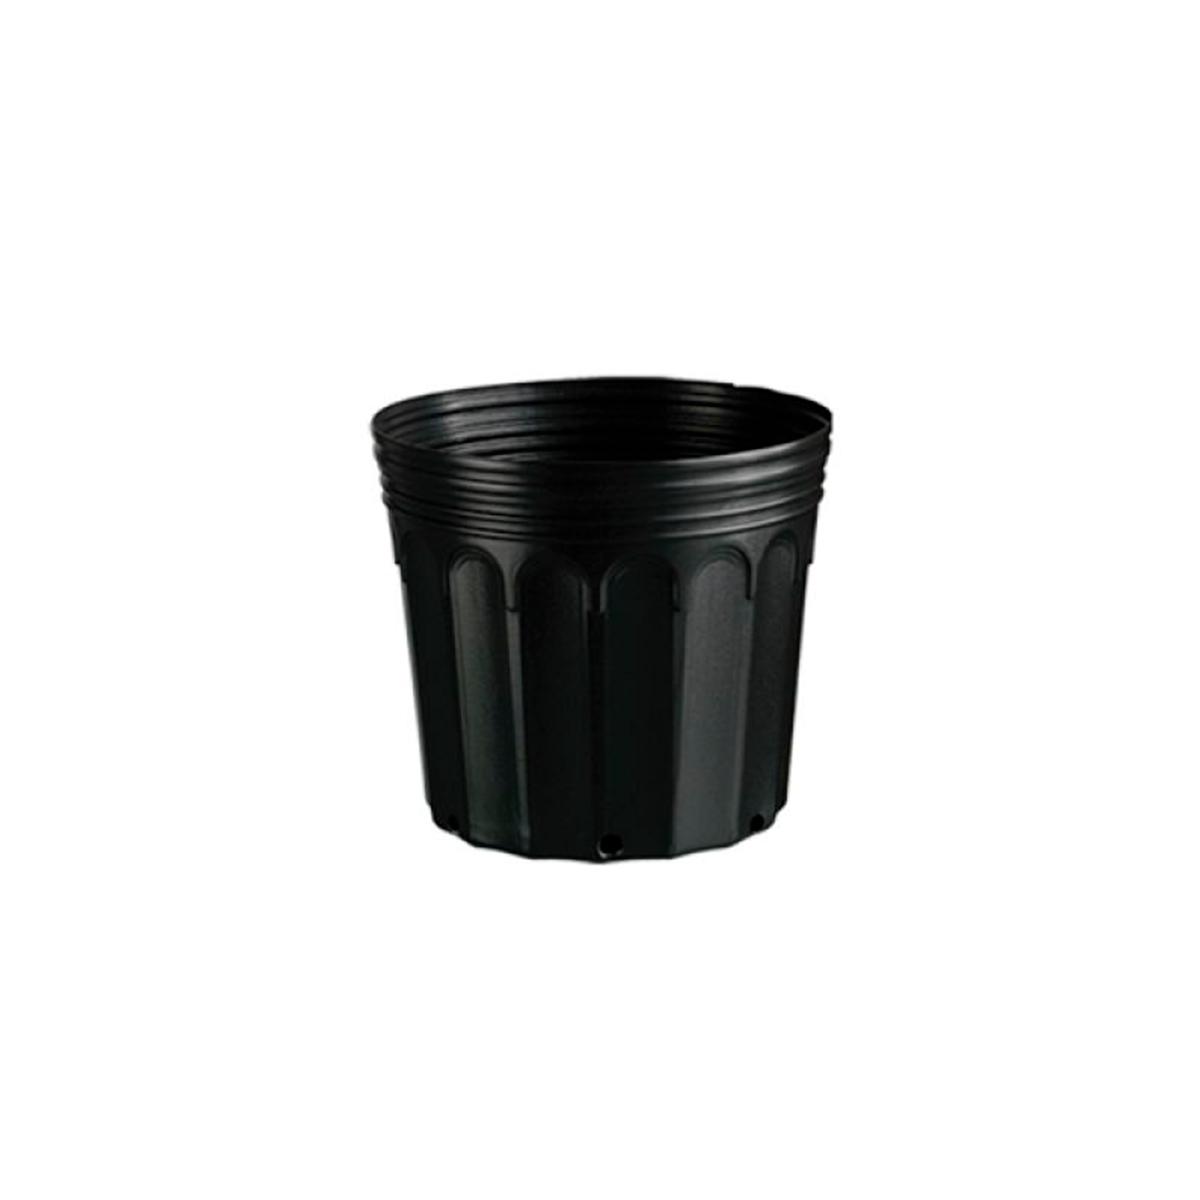 Kit 30 Embalagem Vaso para Mudas Plástico 3,6L